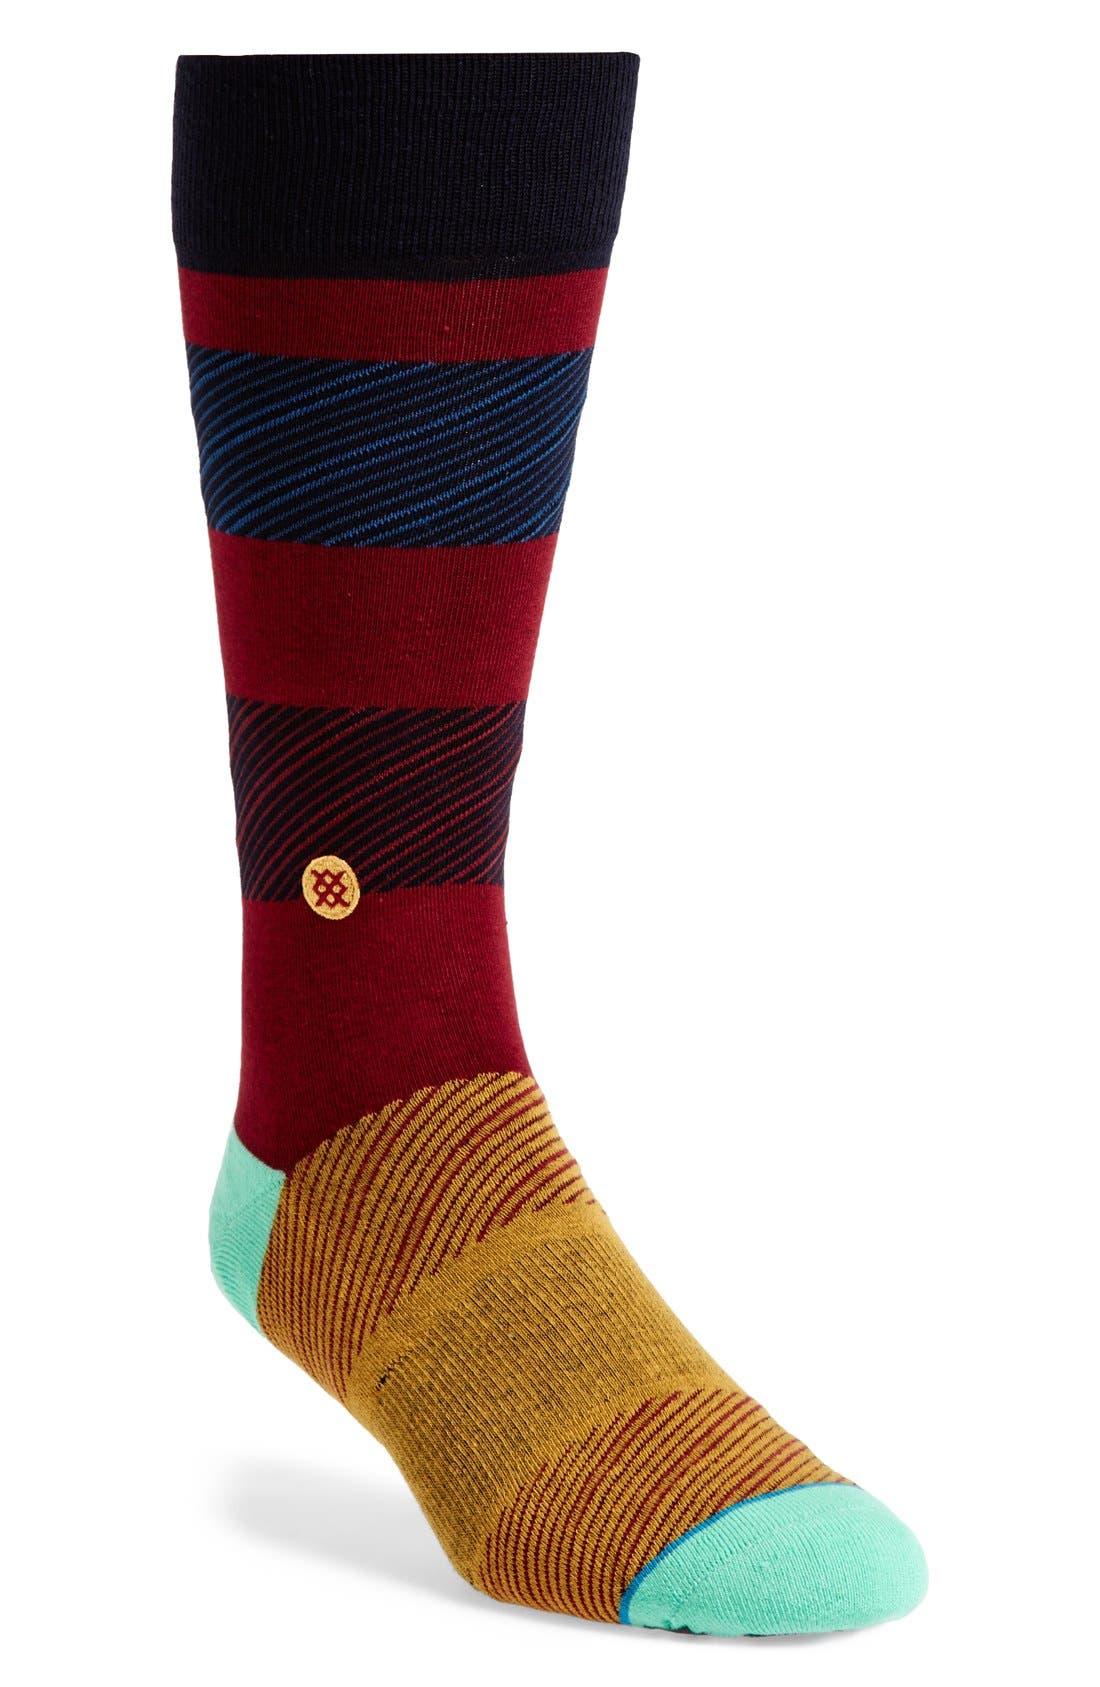 Main Image - Stance 'Wagner' Socks